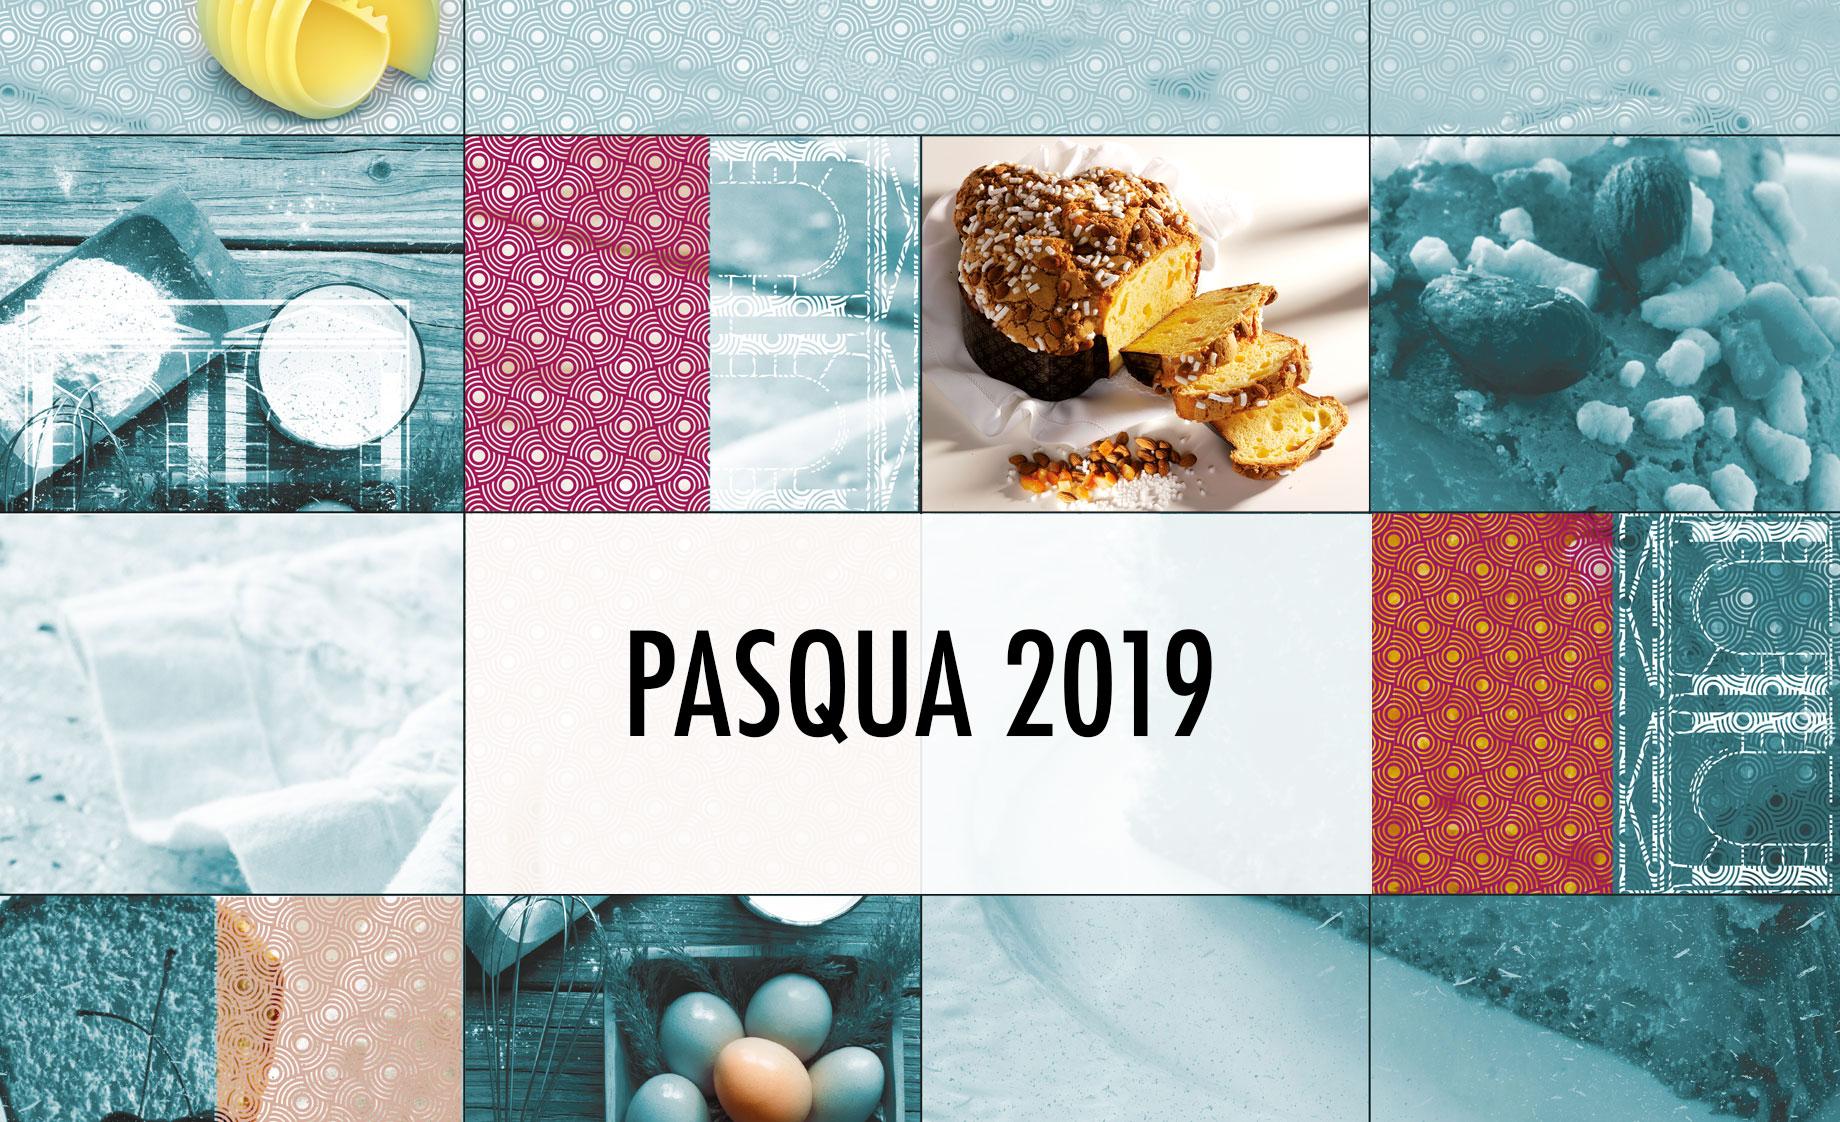 Header-1-Pasqua-2019-Borsari